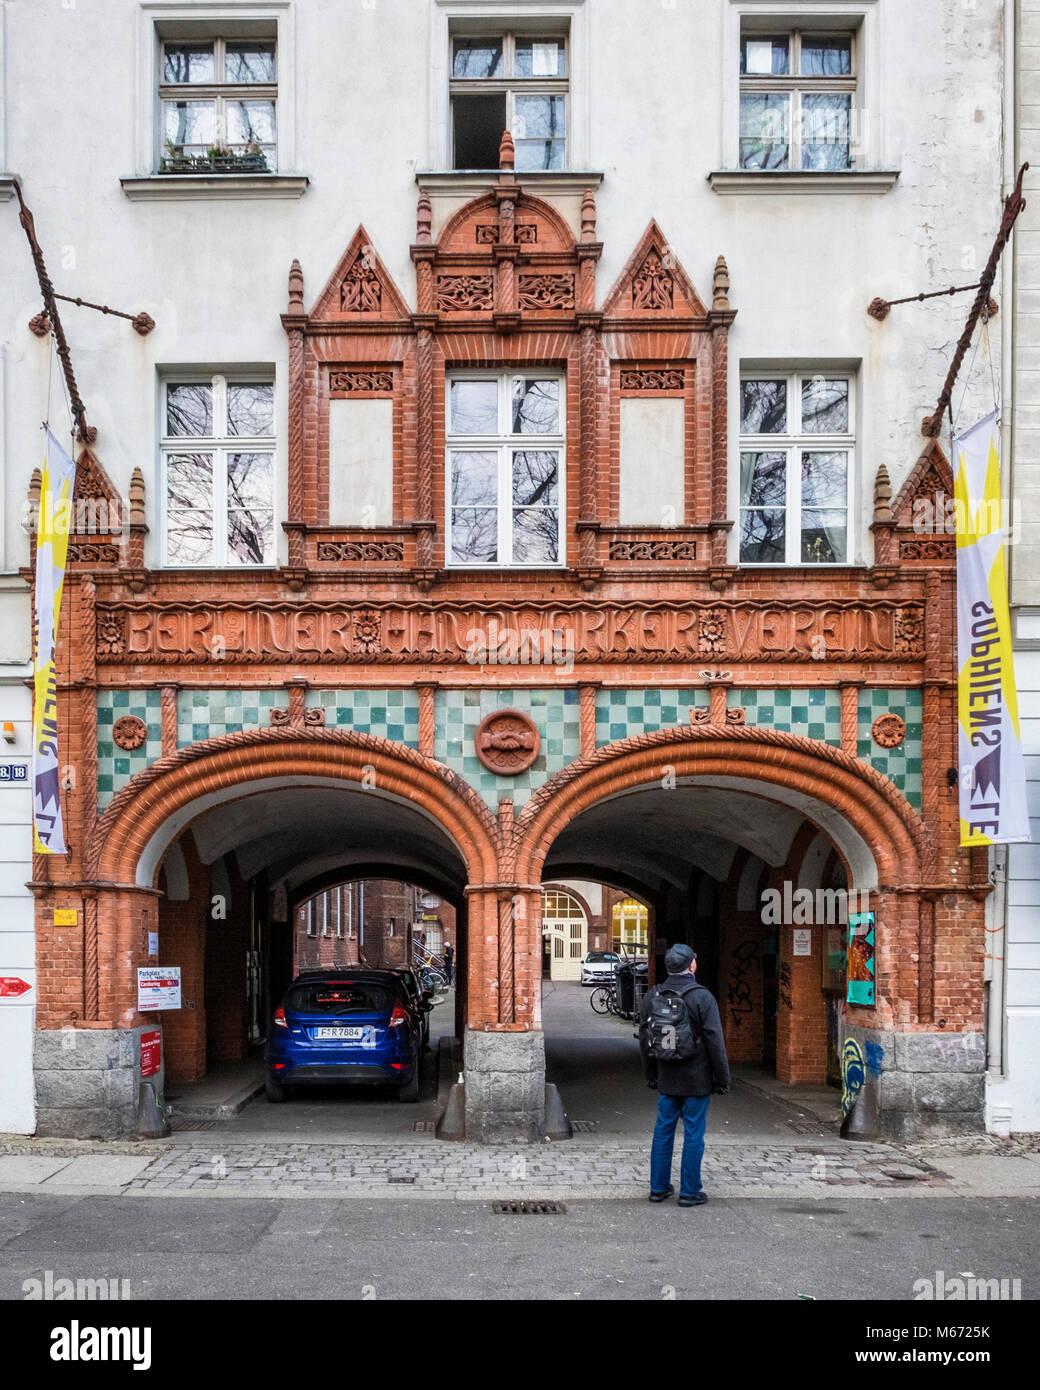 Handwerker Berlin berlin handwerker verein artisans association house elaborate